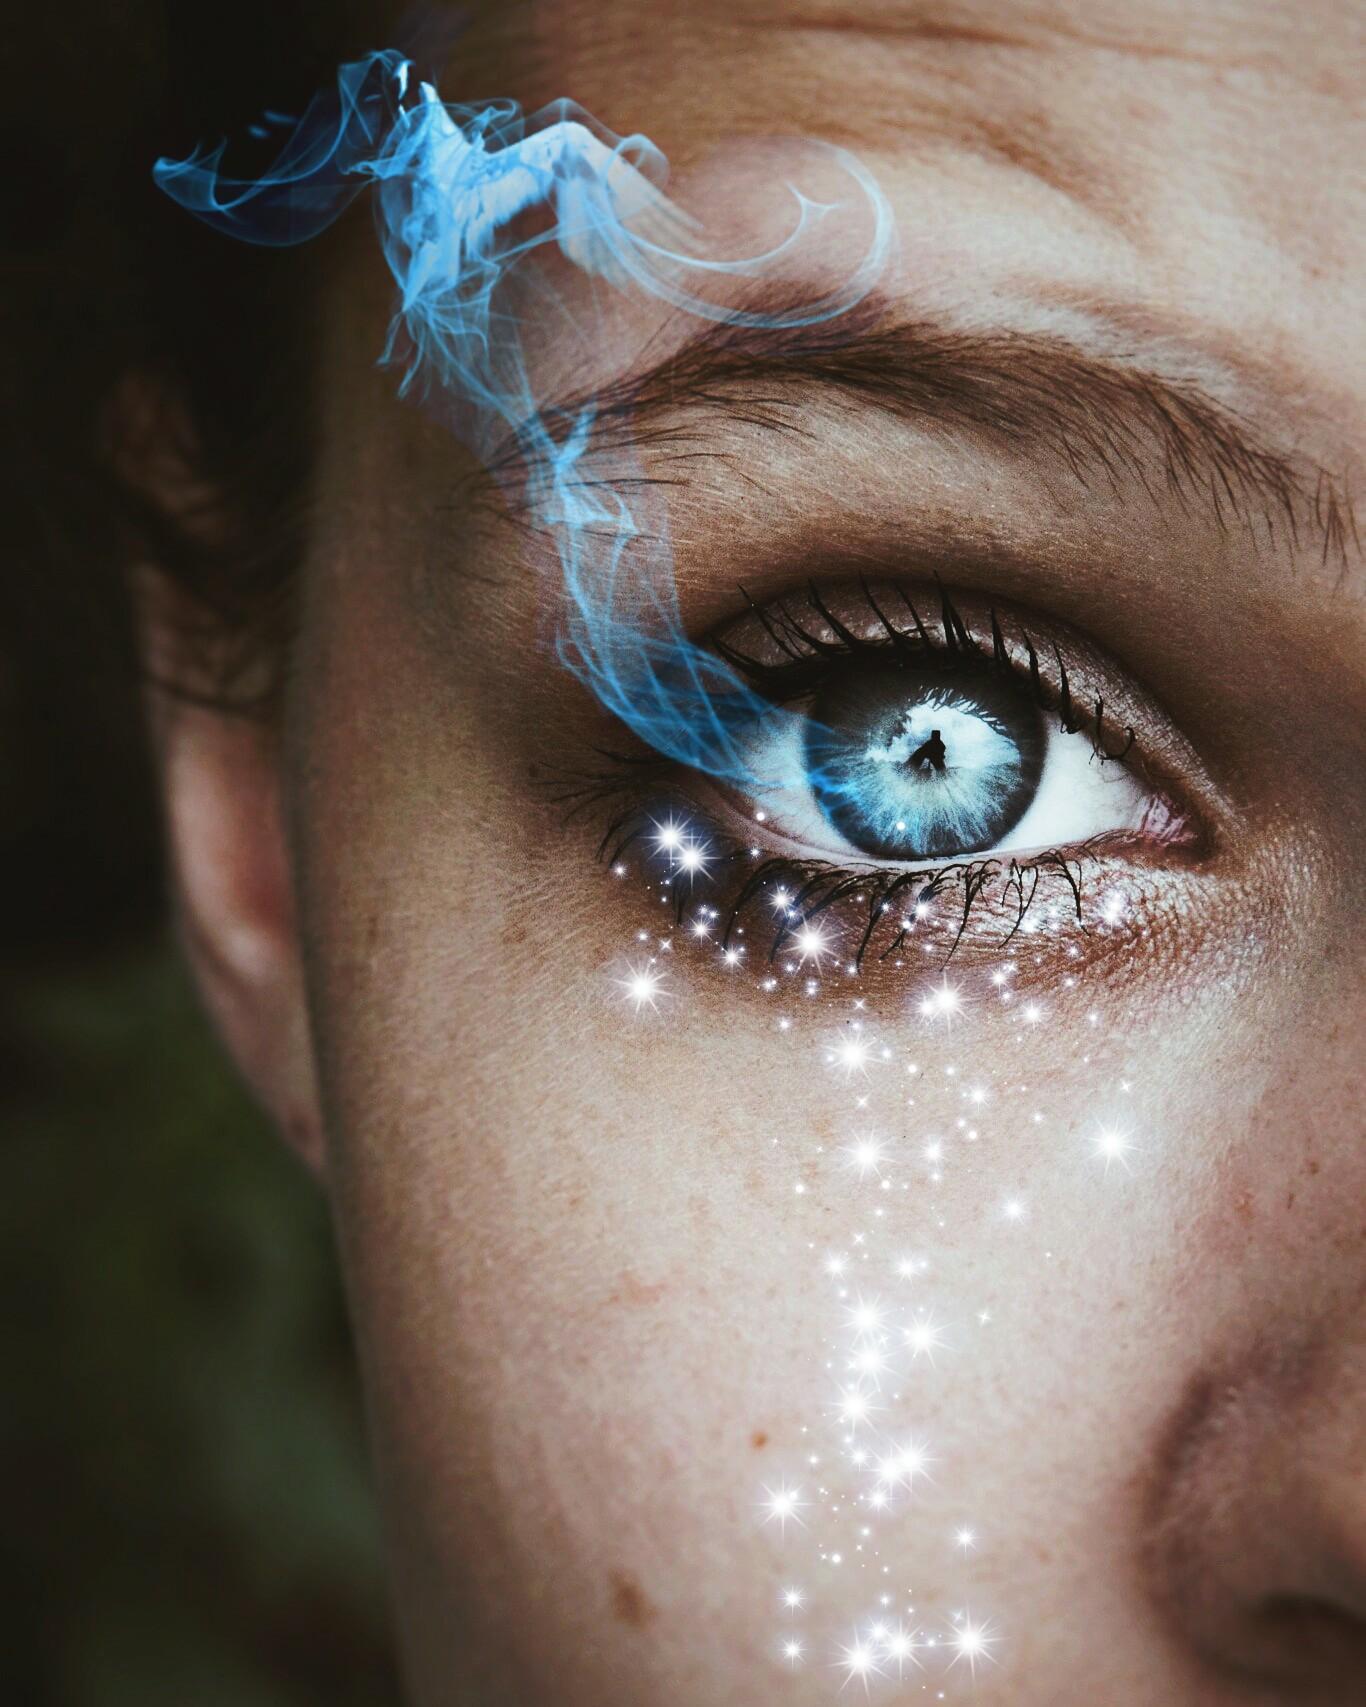 #freetoedit #cry #glitter #glitters #edit #edits #blue